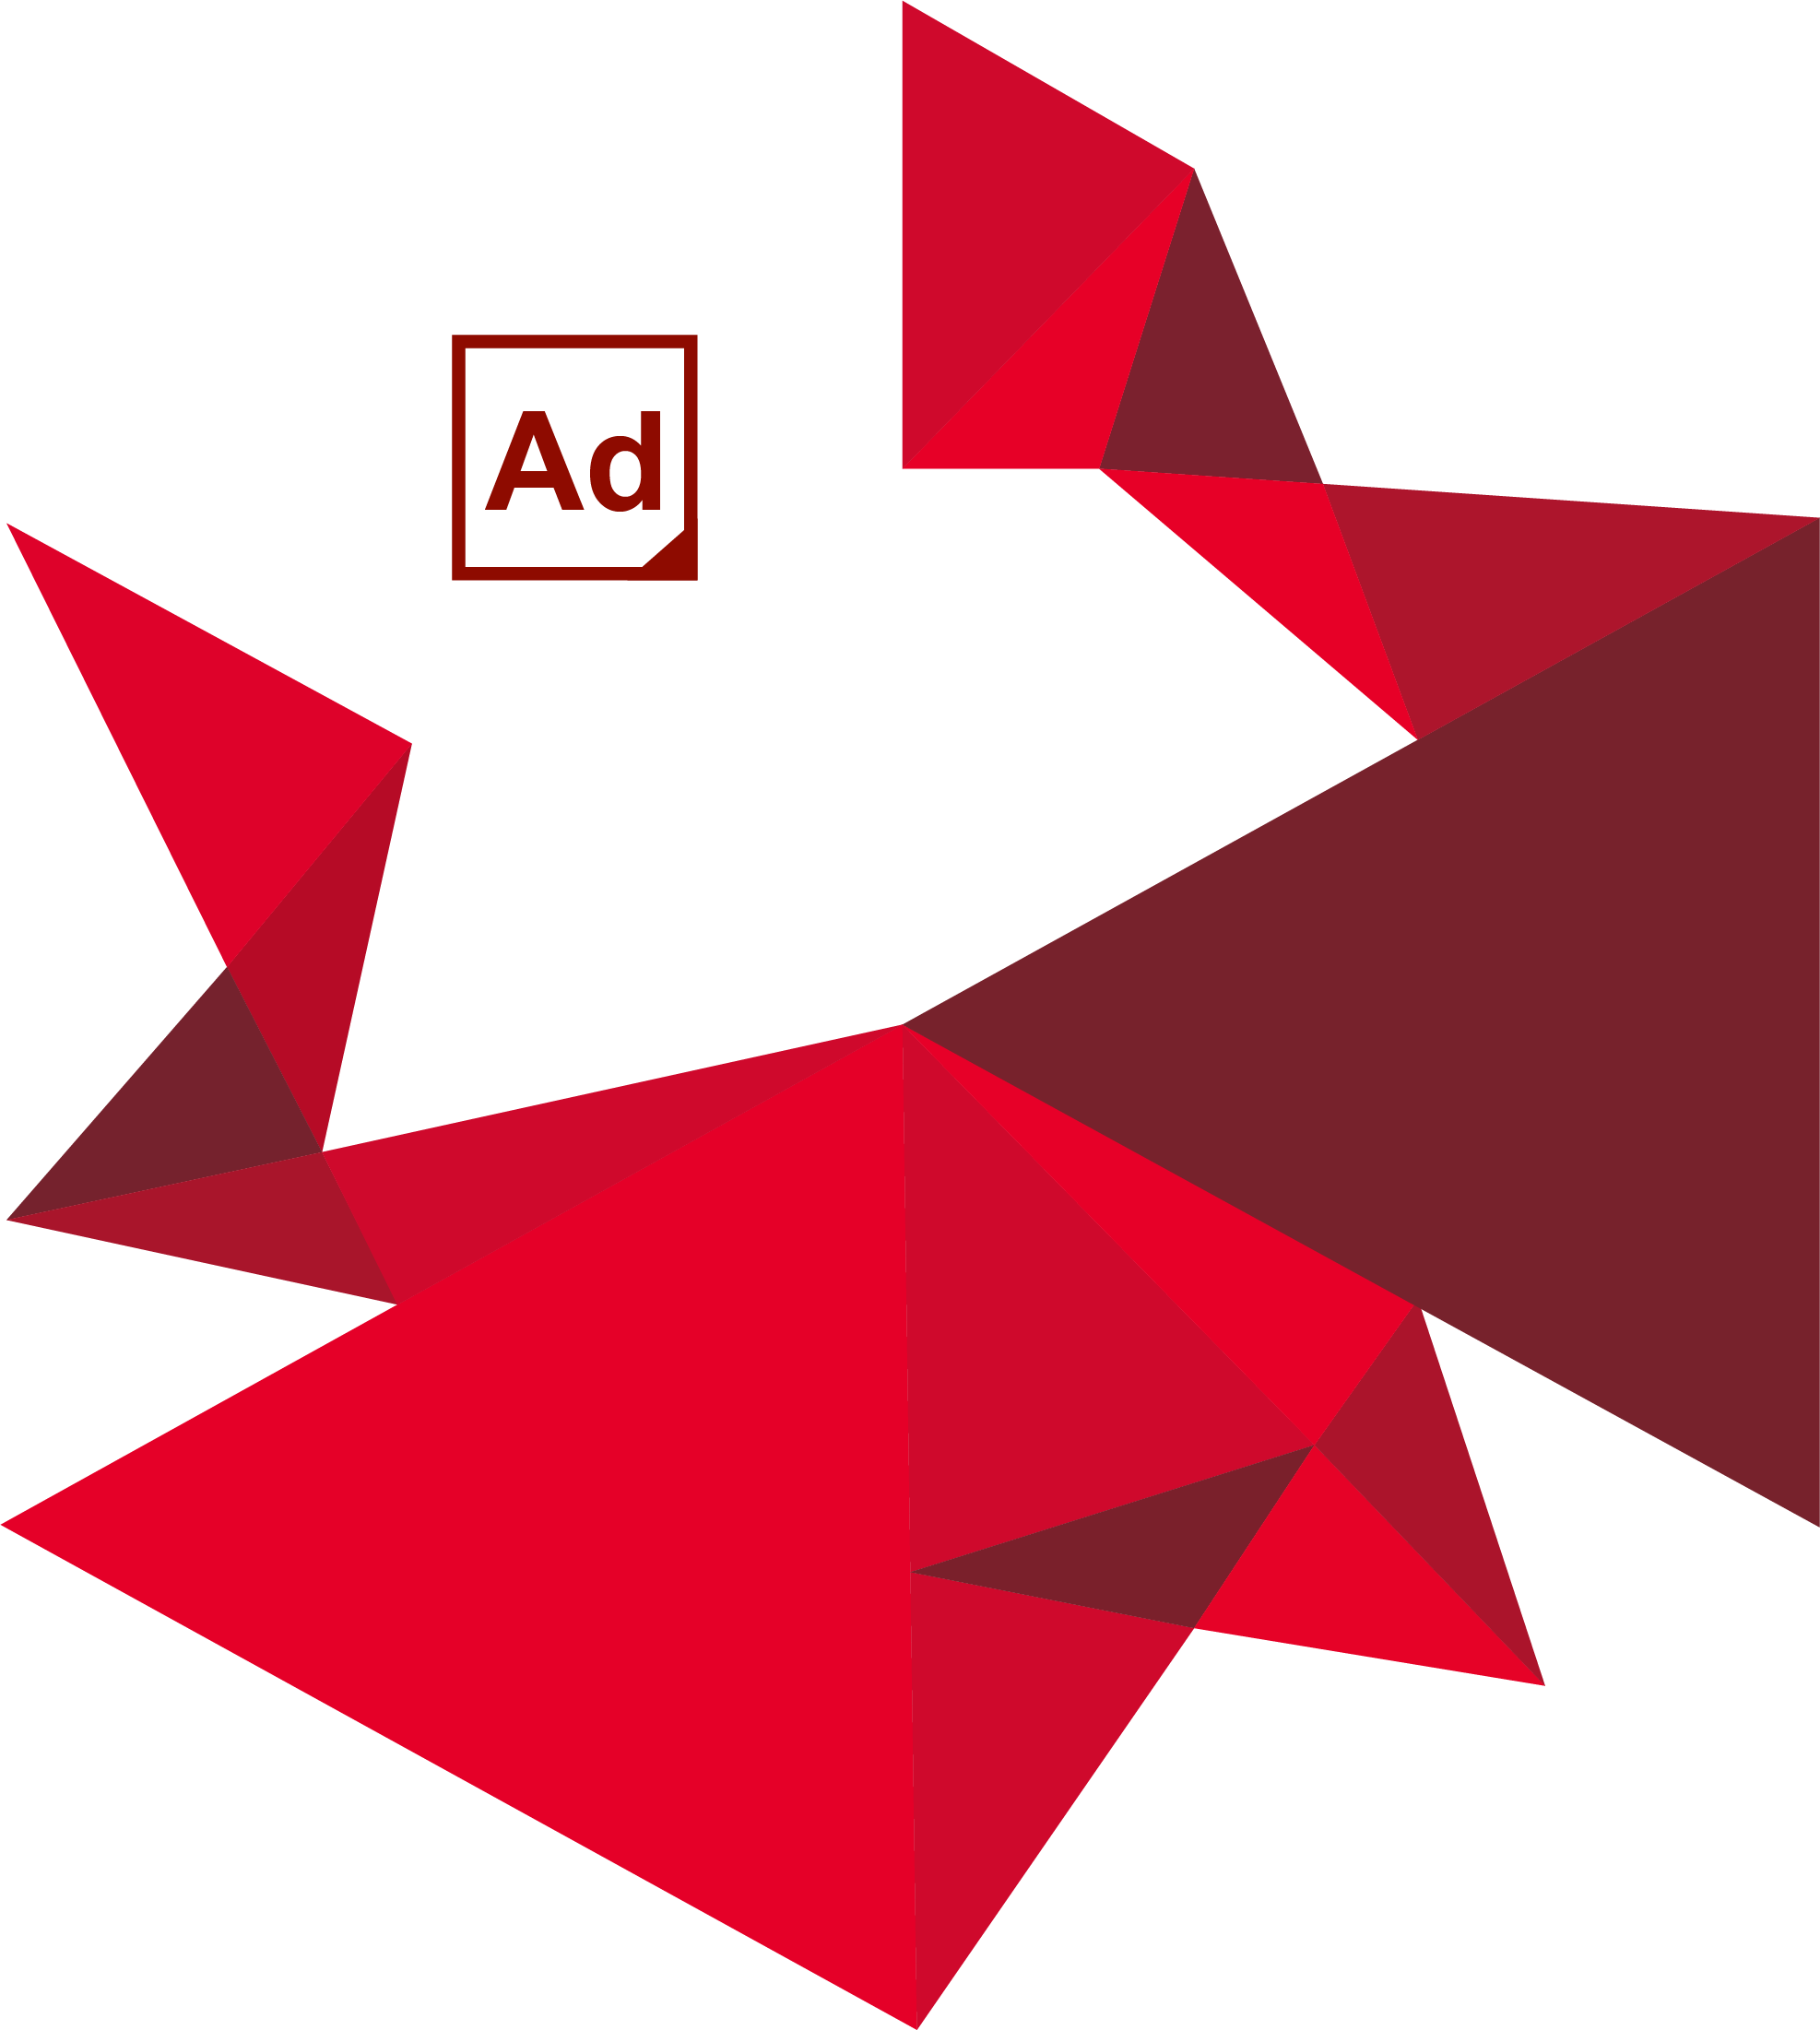 adams 2020 logo